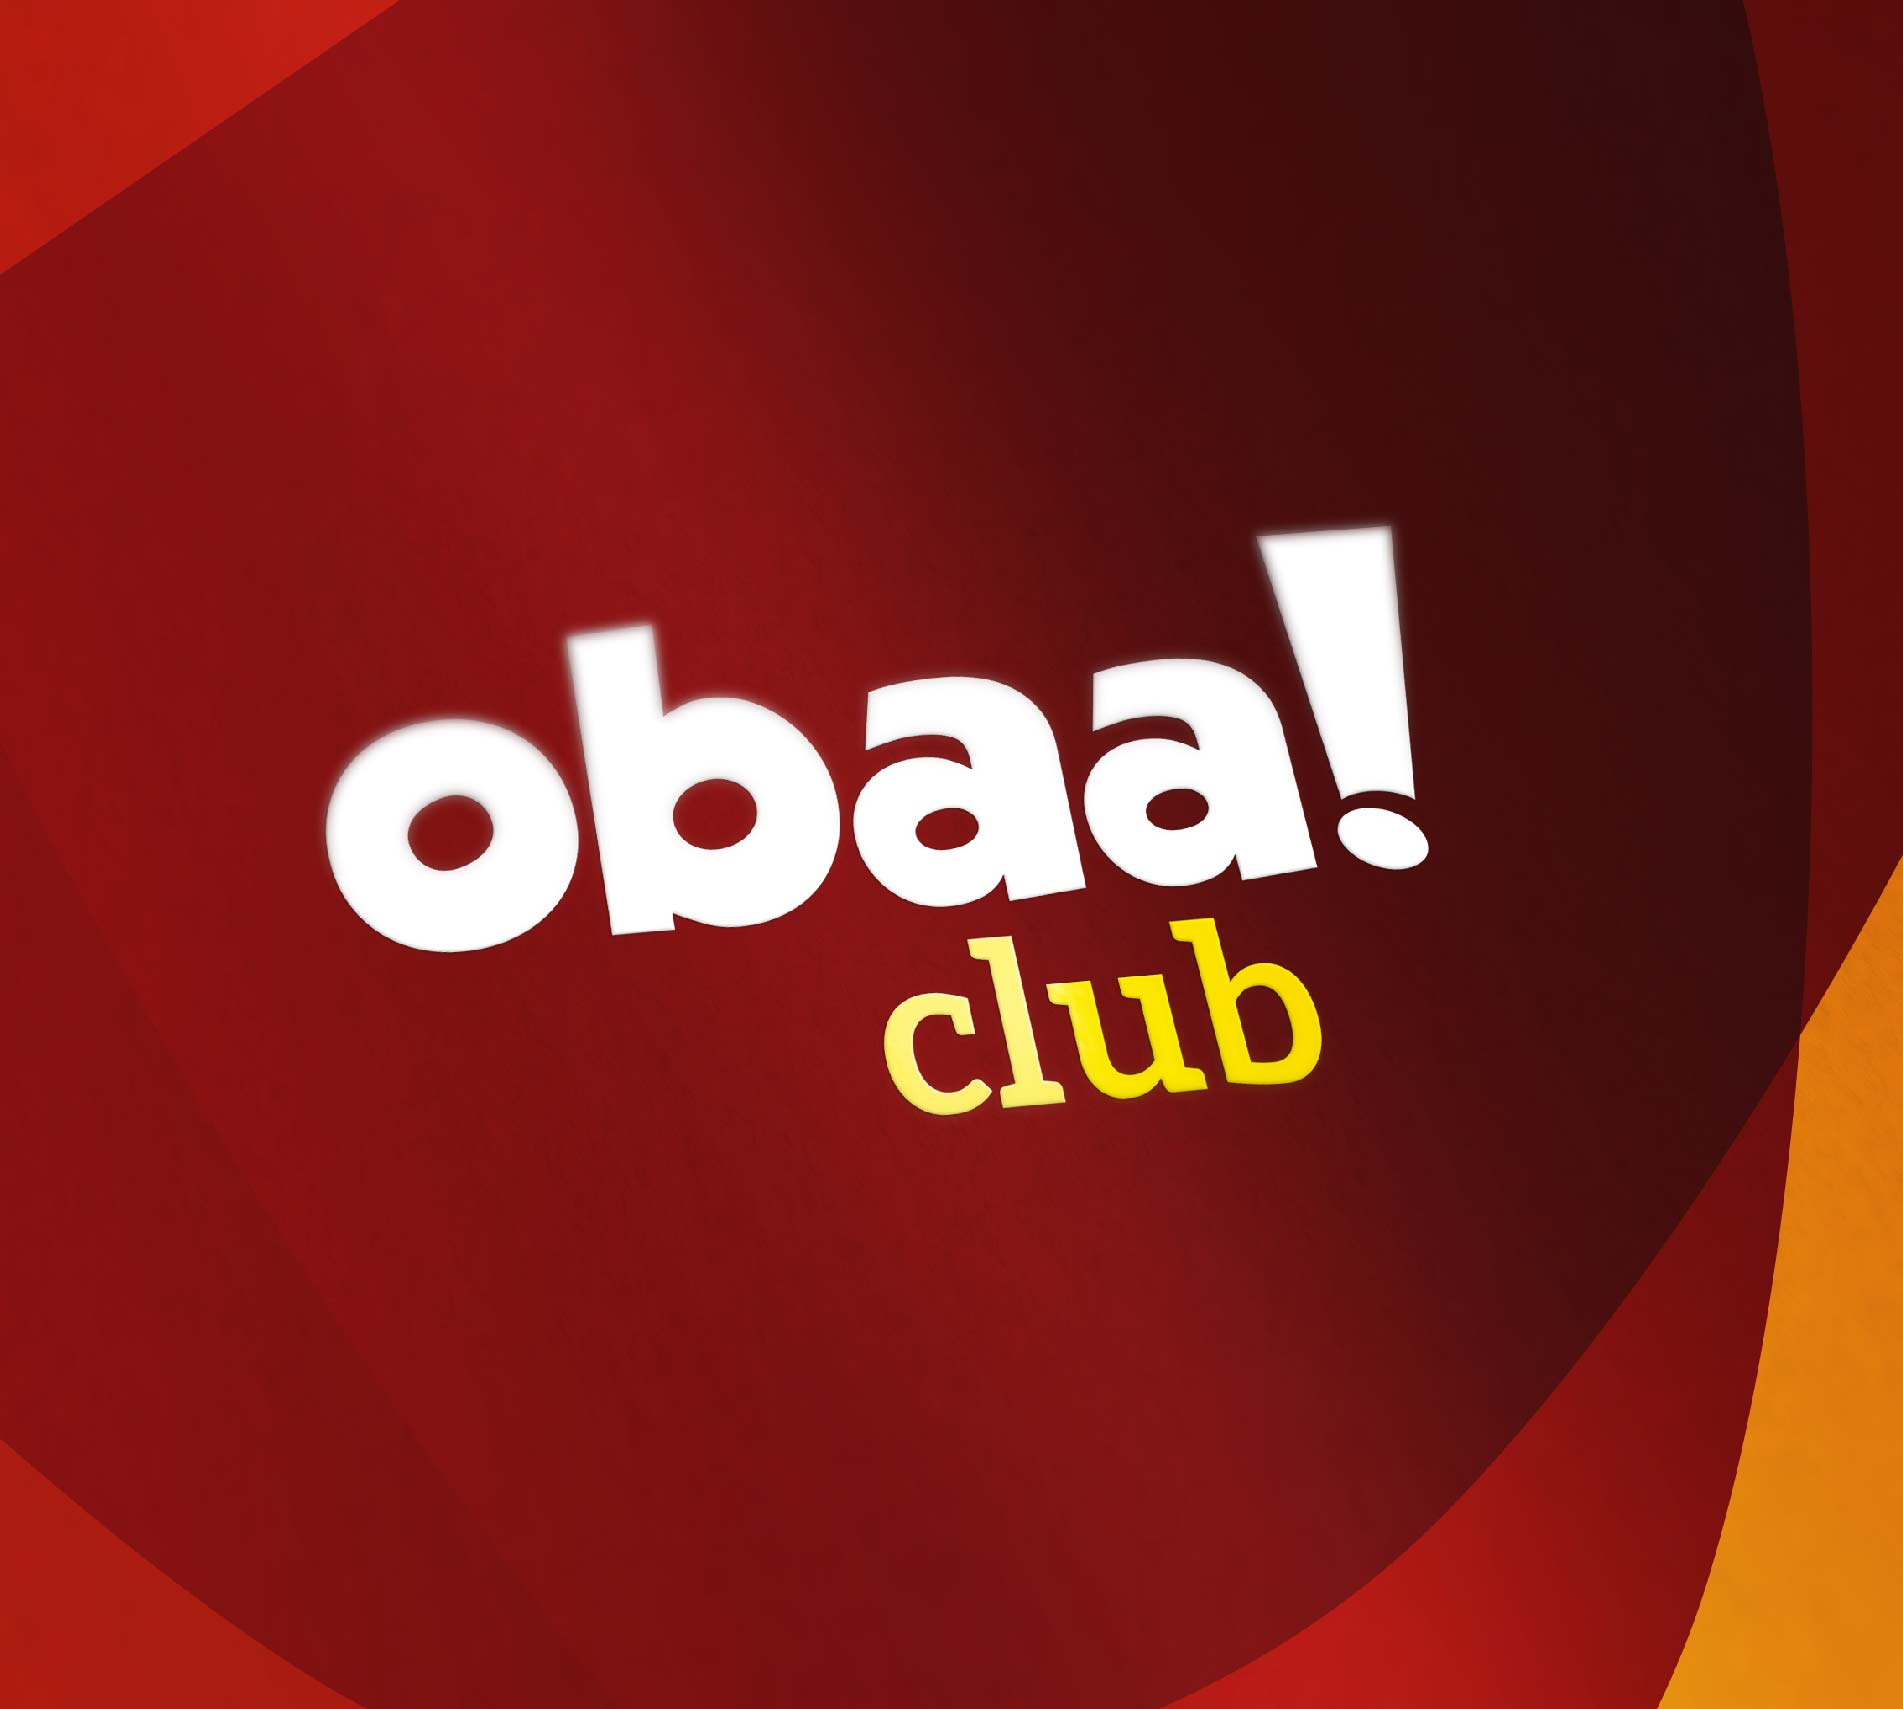 logo-obaa-club1.jpg